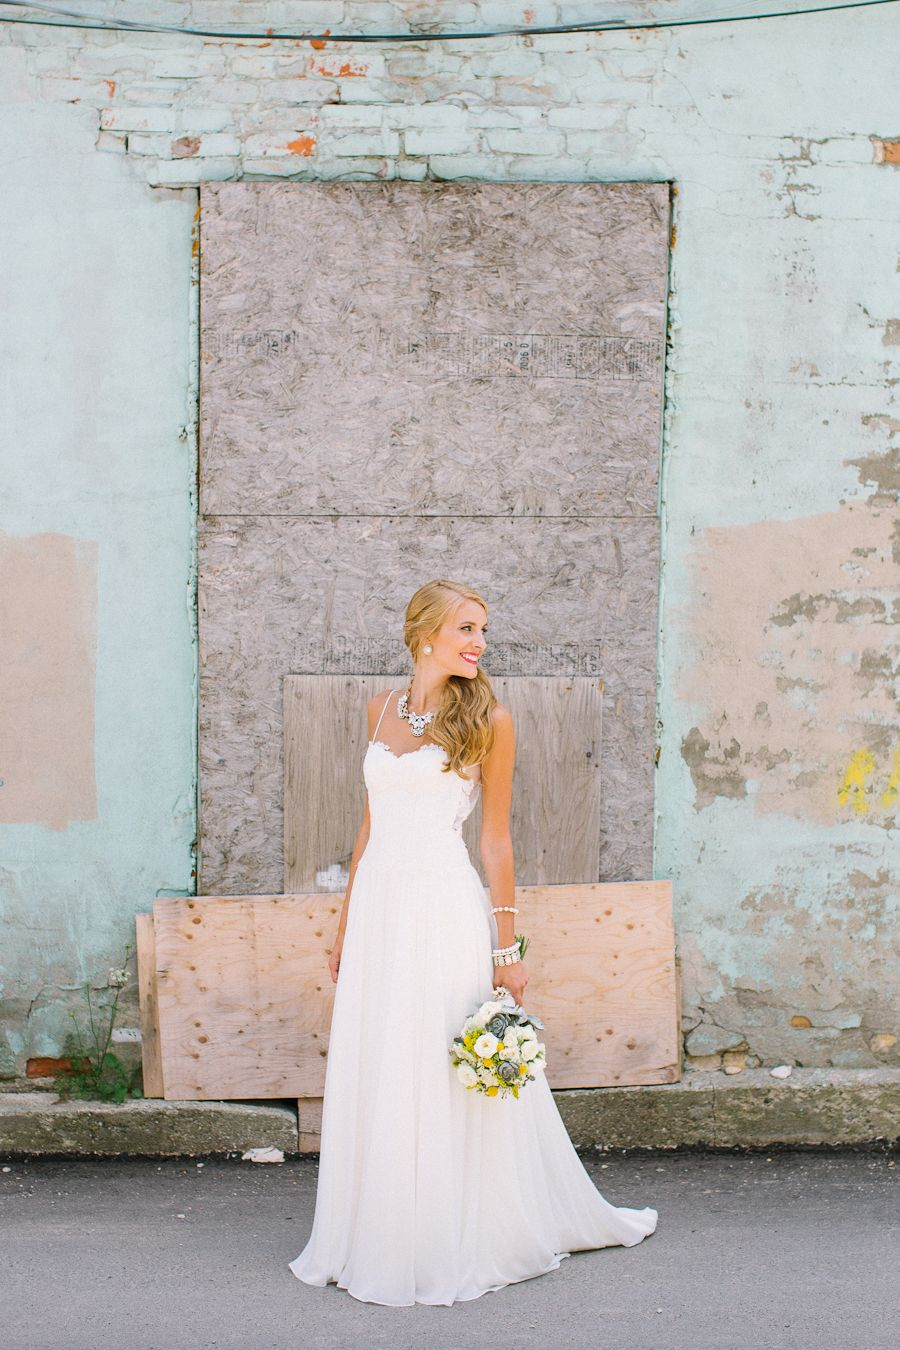 Fun bride u groom blue and yellow wedding photo andrew mark